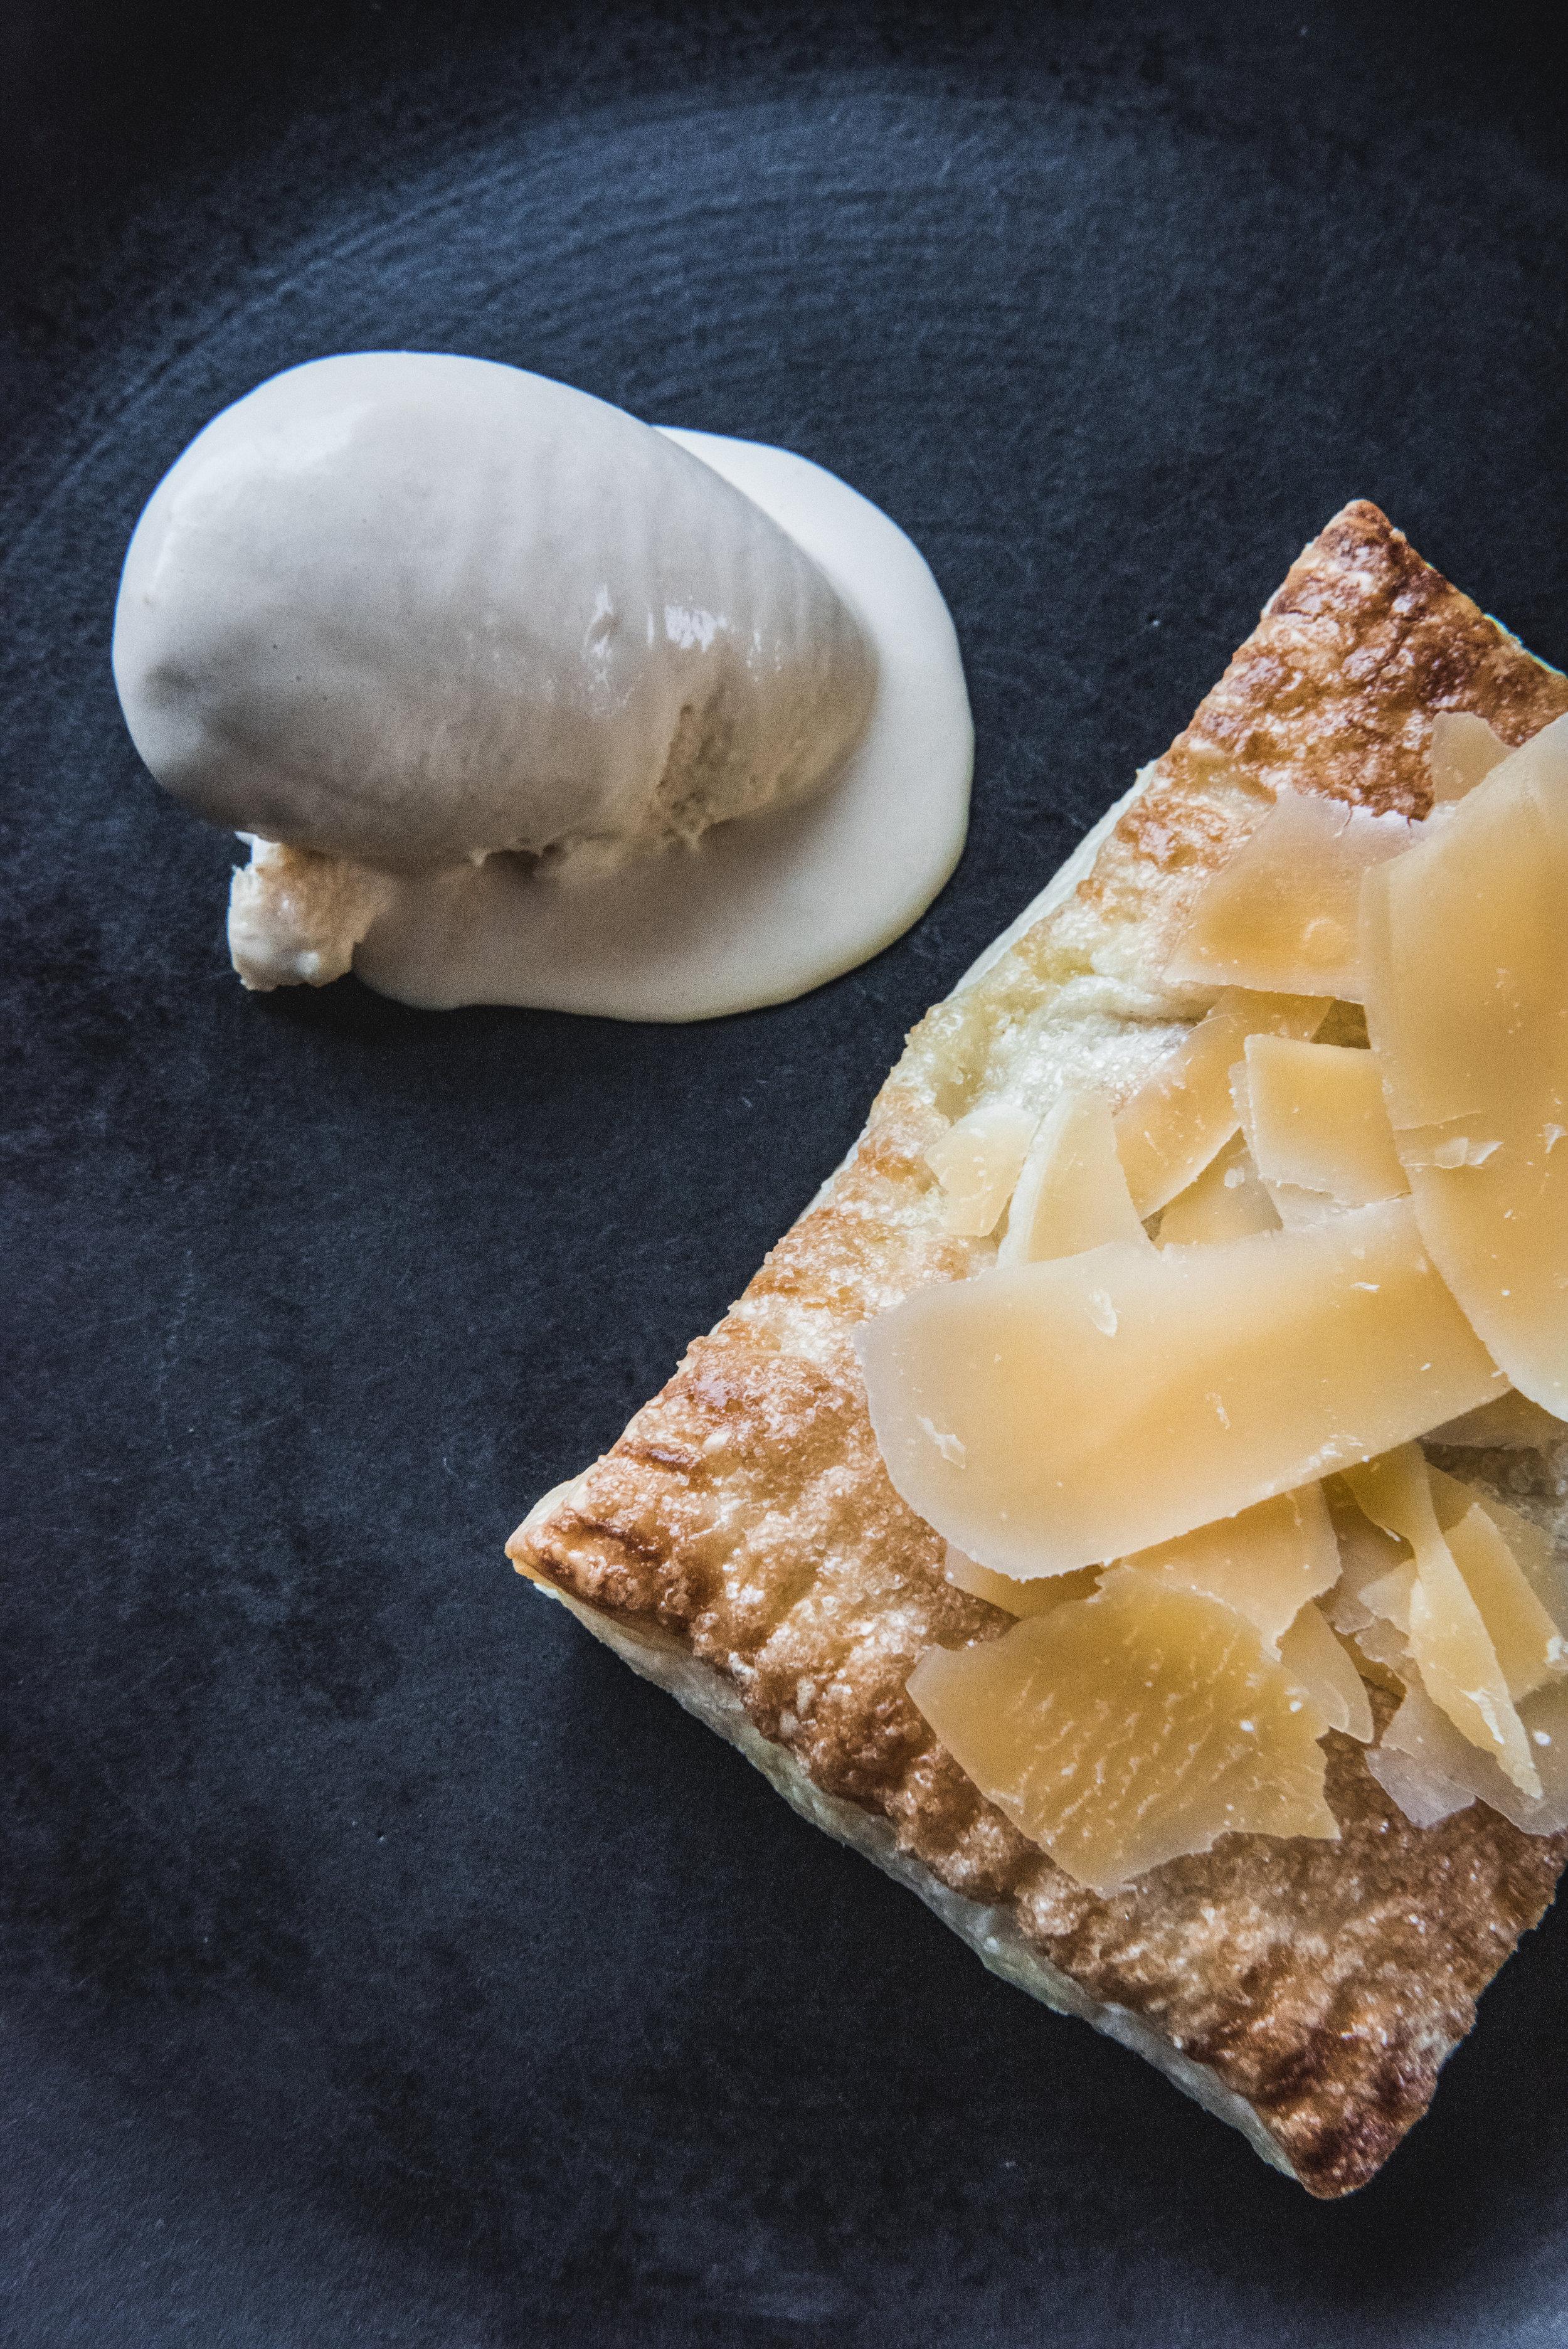 Apple poptart with Caramel-Cream Fraiche Ice Cream and aged Gouda